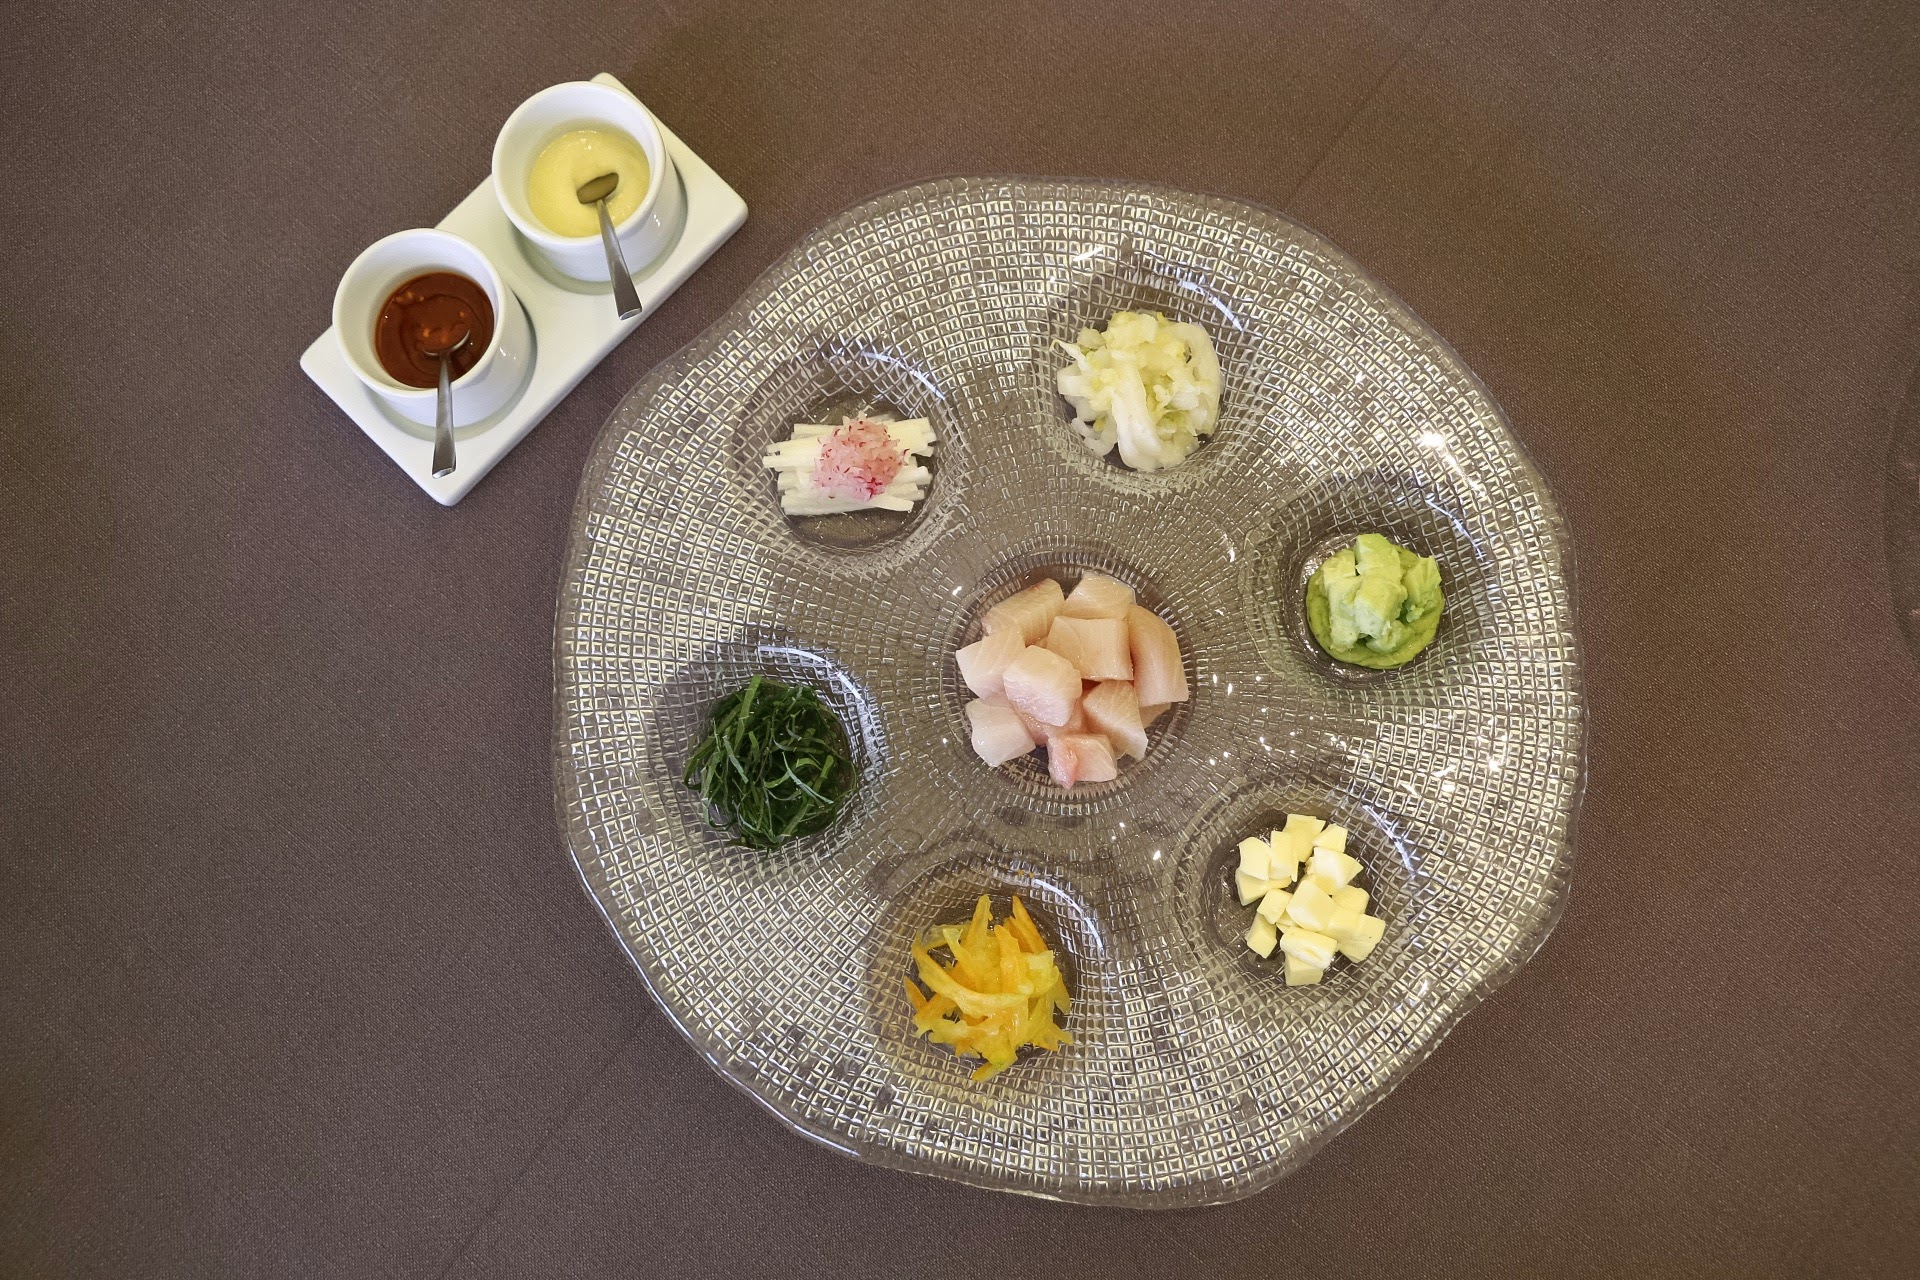 Jung Sik Dang, Amuse Bouche, Korea, Yellowtail